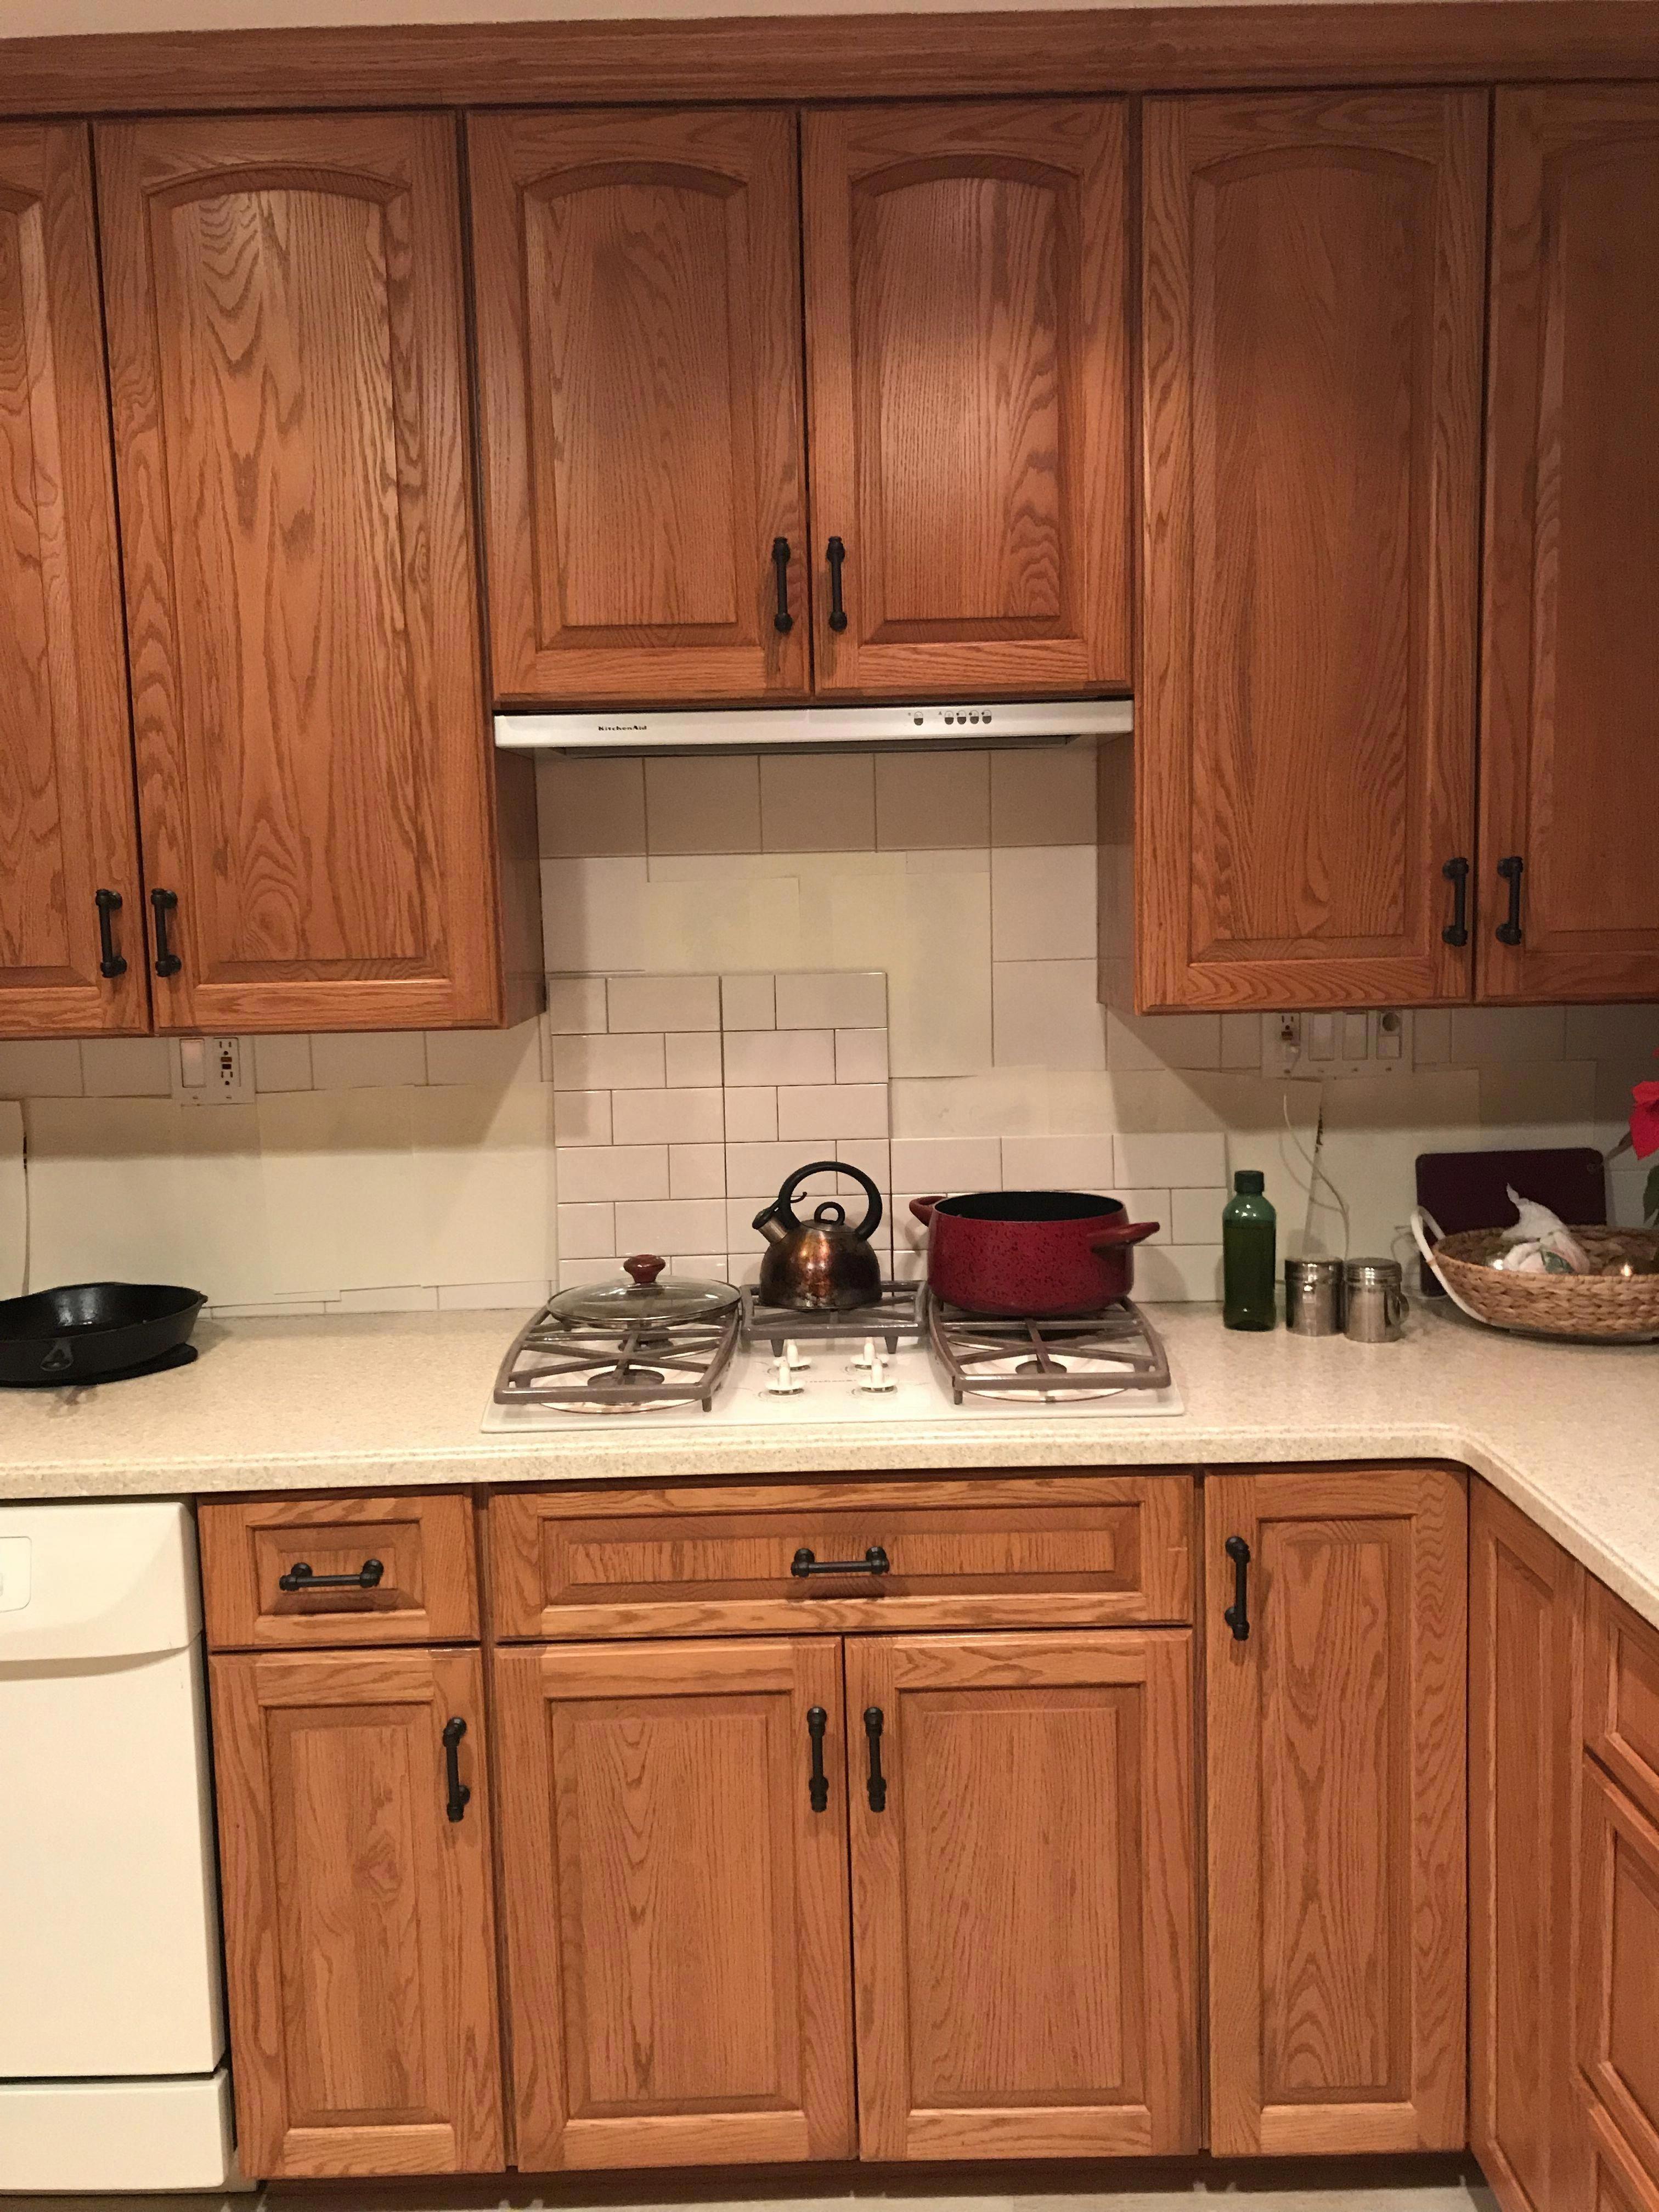 Mobile Home Kitchen Remodel Butcher Blocks Kitchenremodelideassink Mobilehomekitchenremodel Kitchen Remodel Kitchen Remodel Cost Kitchen Decor Modern